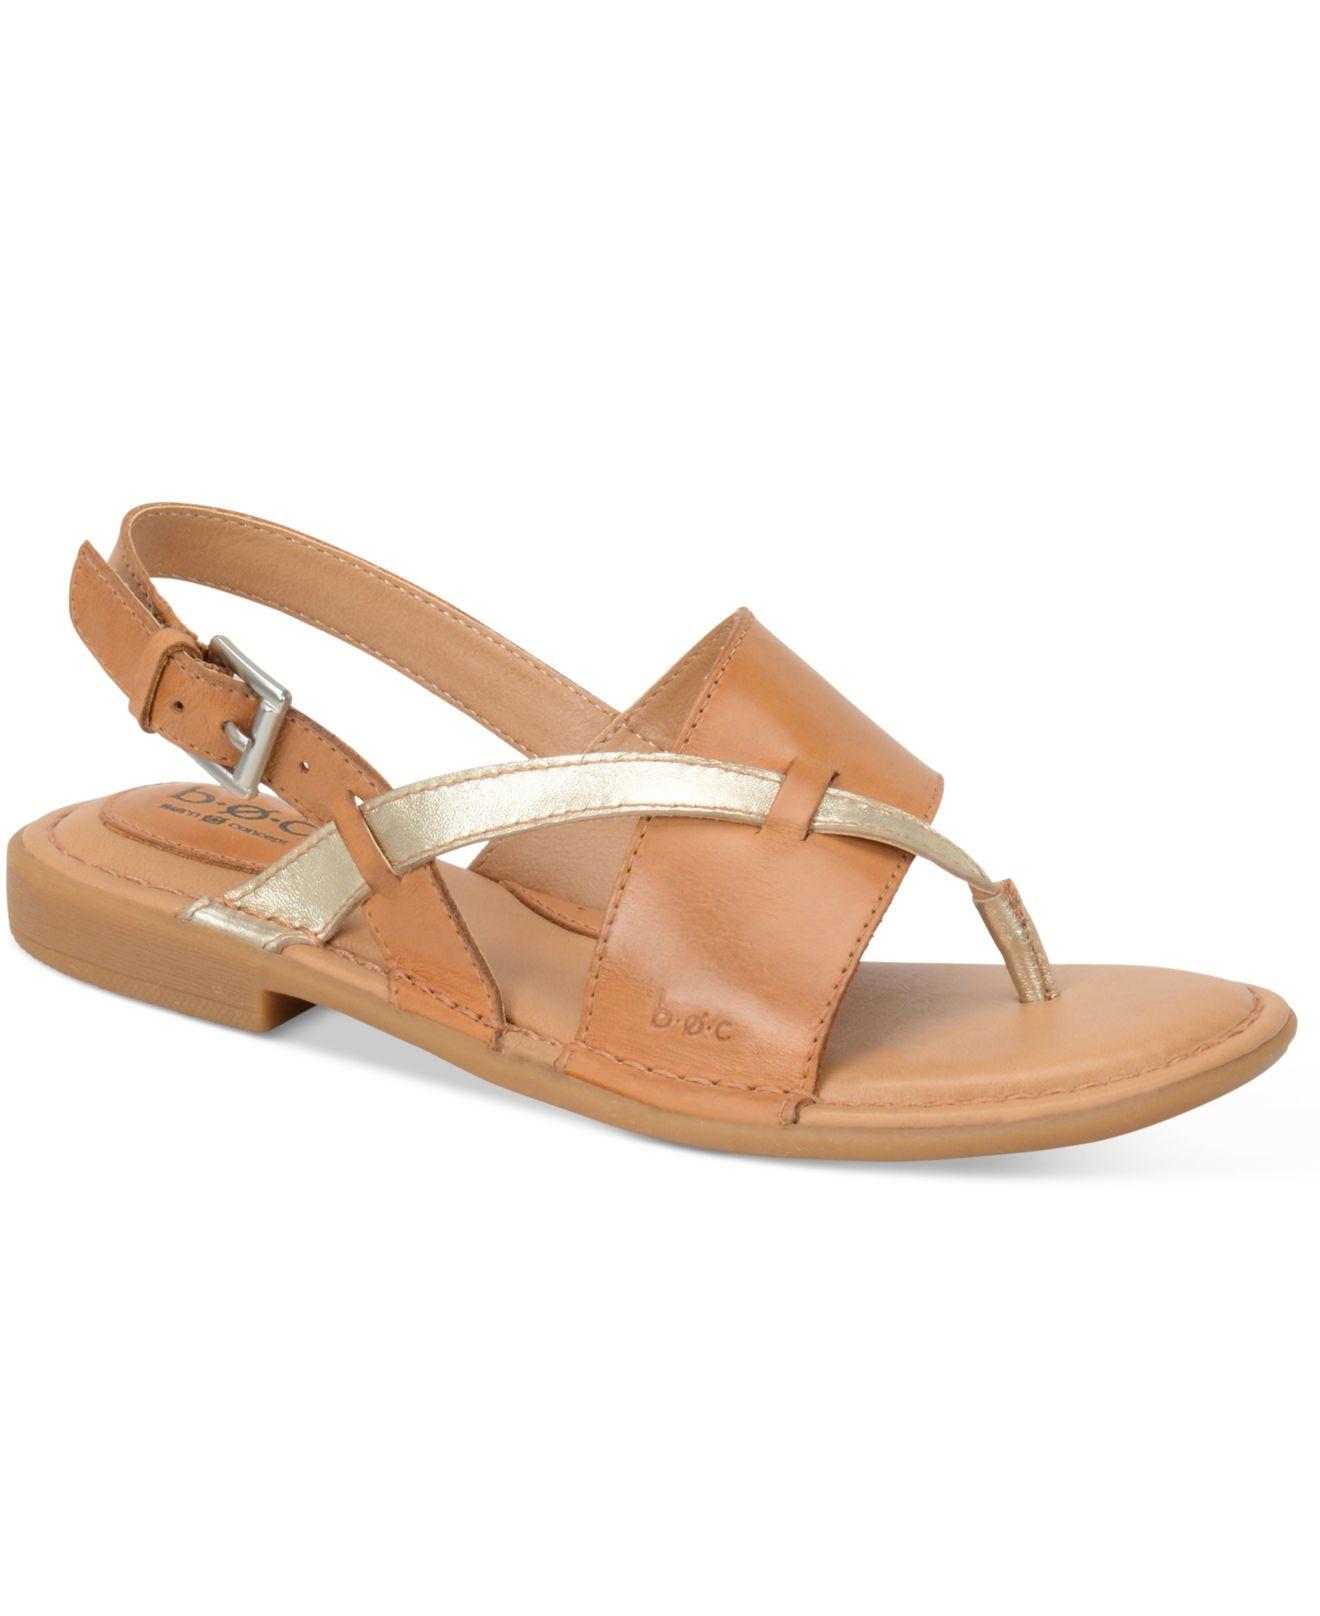 Two Strap Slingback Flat Sandals